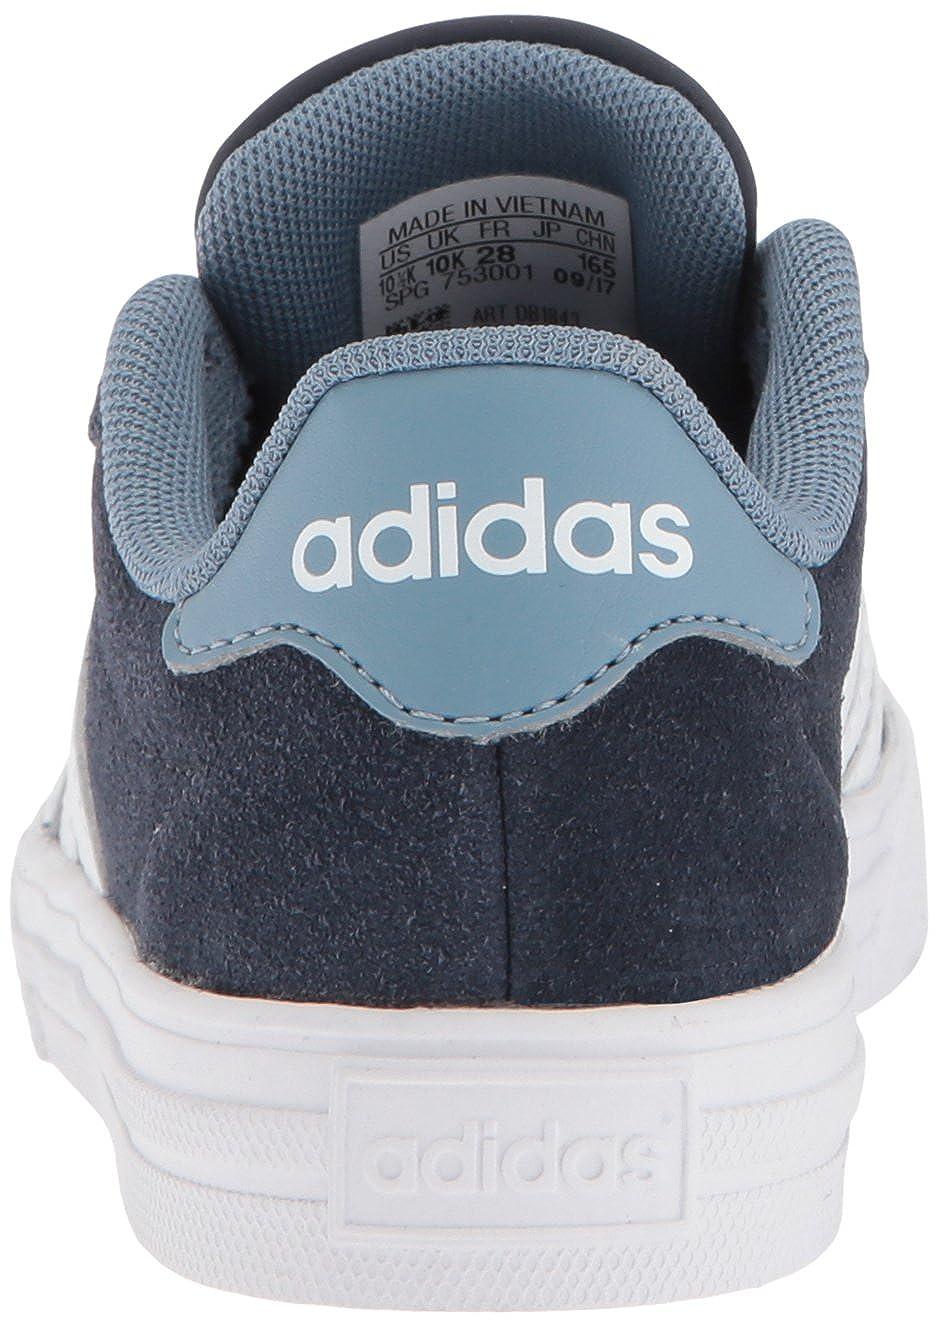 adidas Kids Daily 2.0 Sneaker adidas Kids/' Daily 2.0 Sneaker